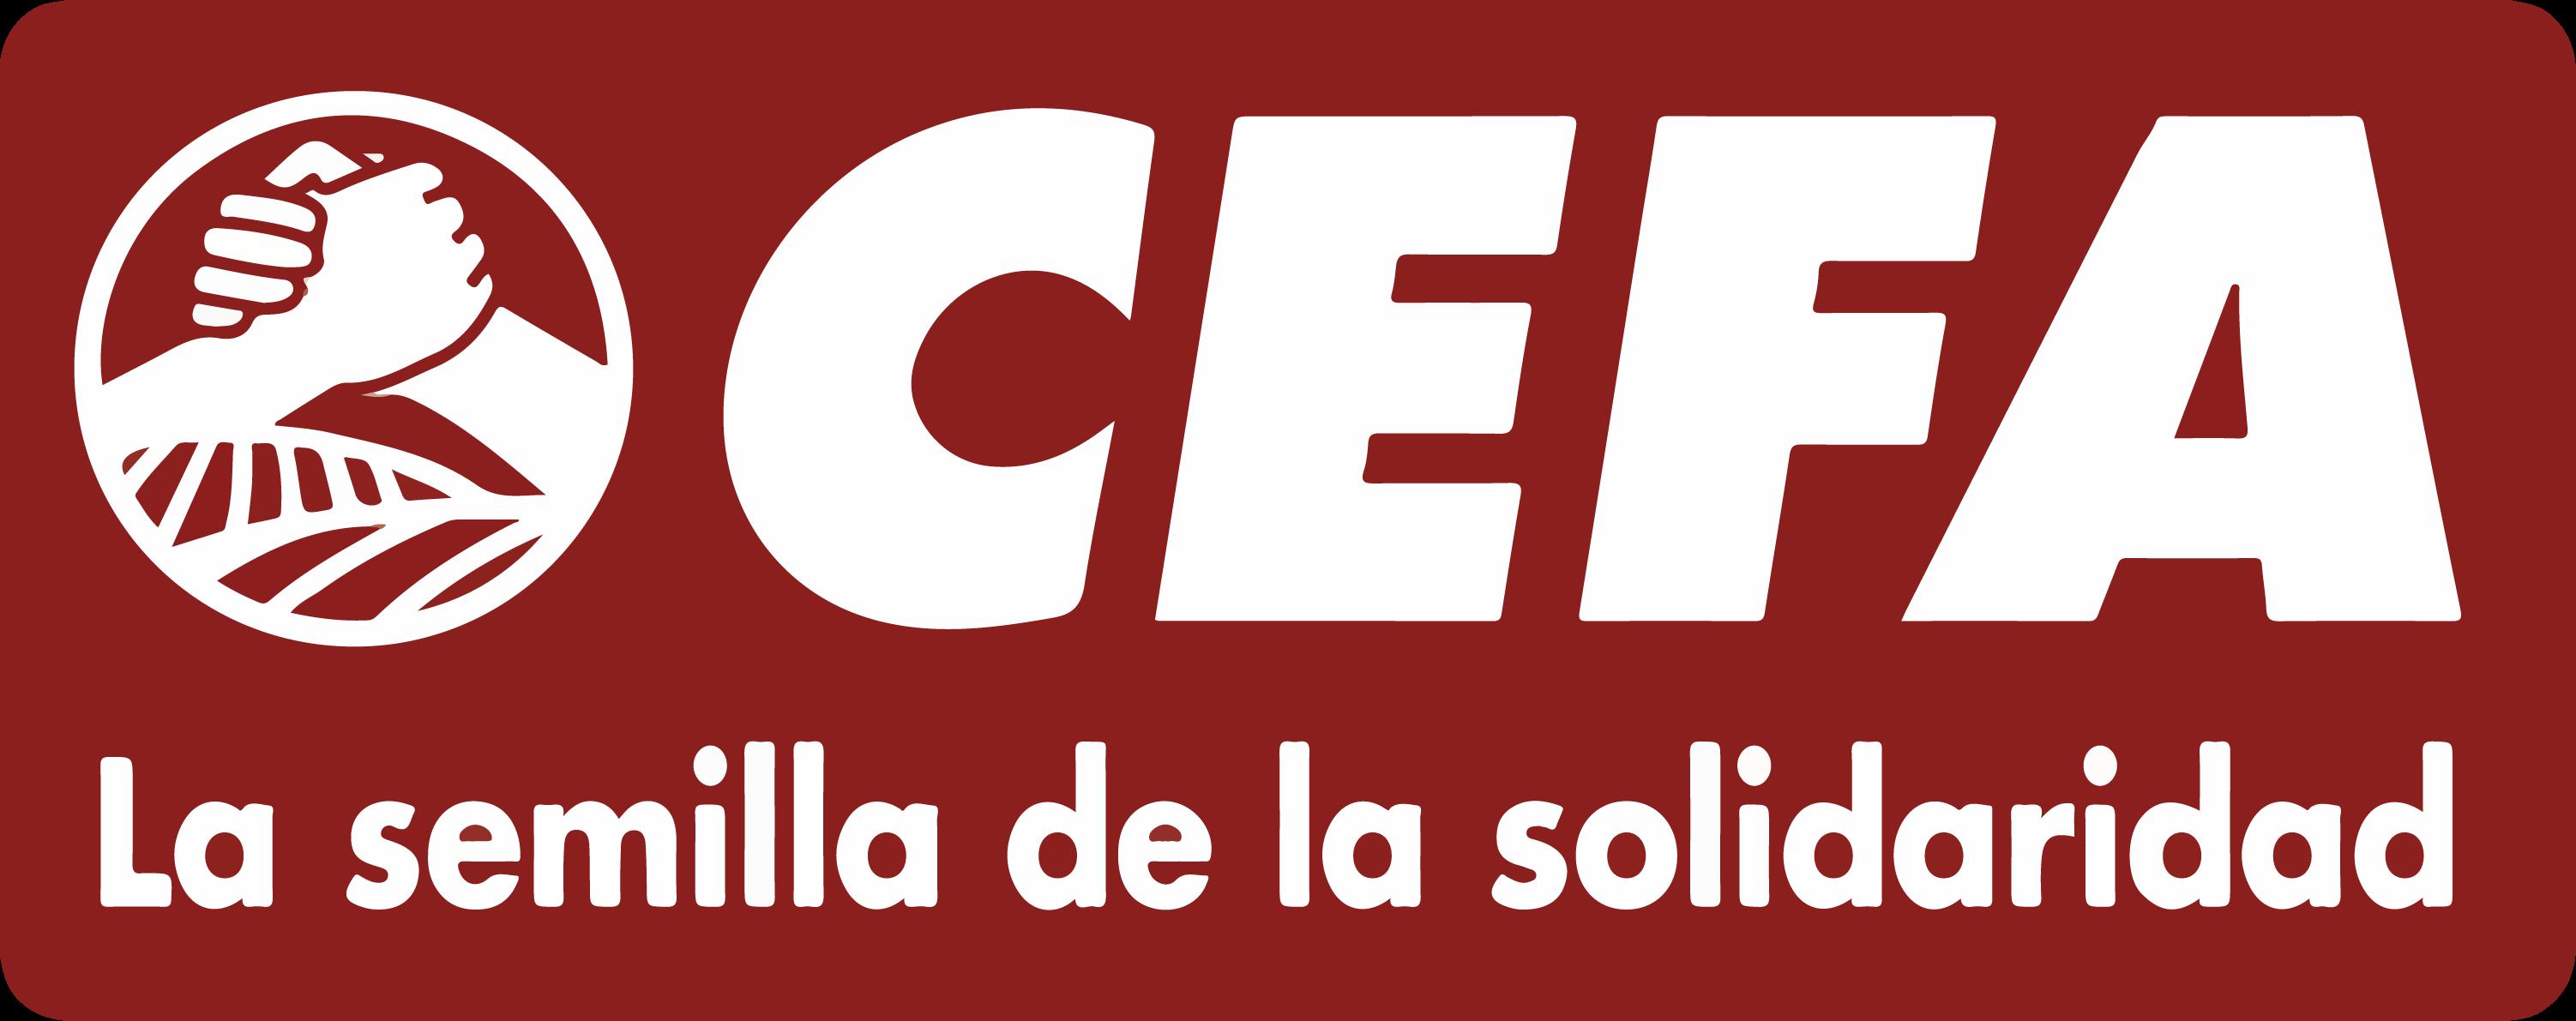 CEFA Ecuador